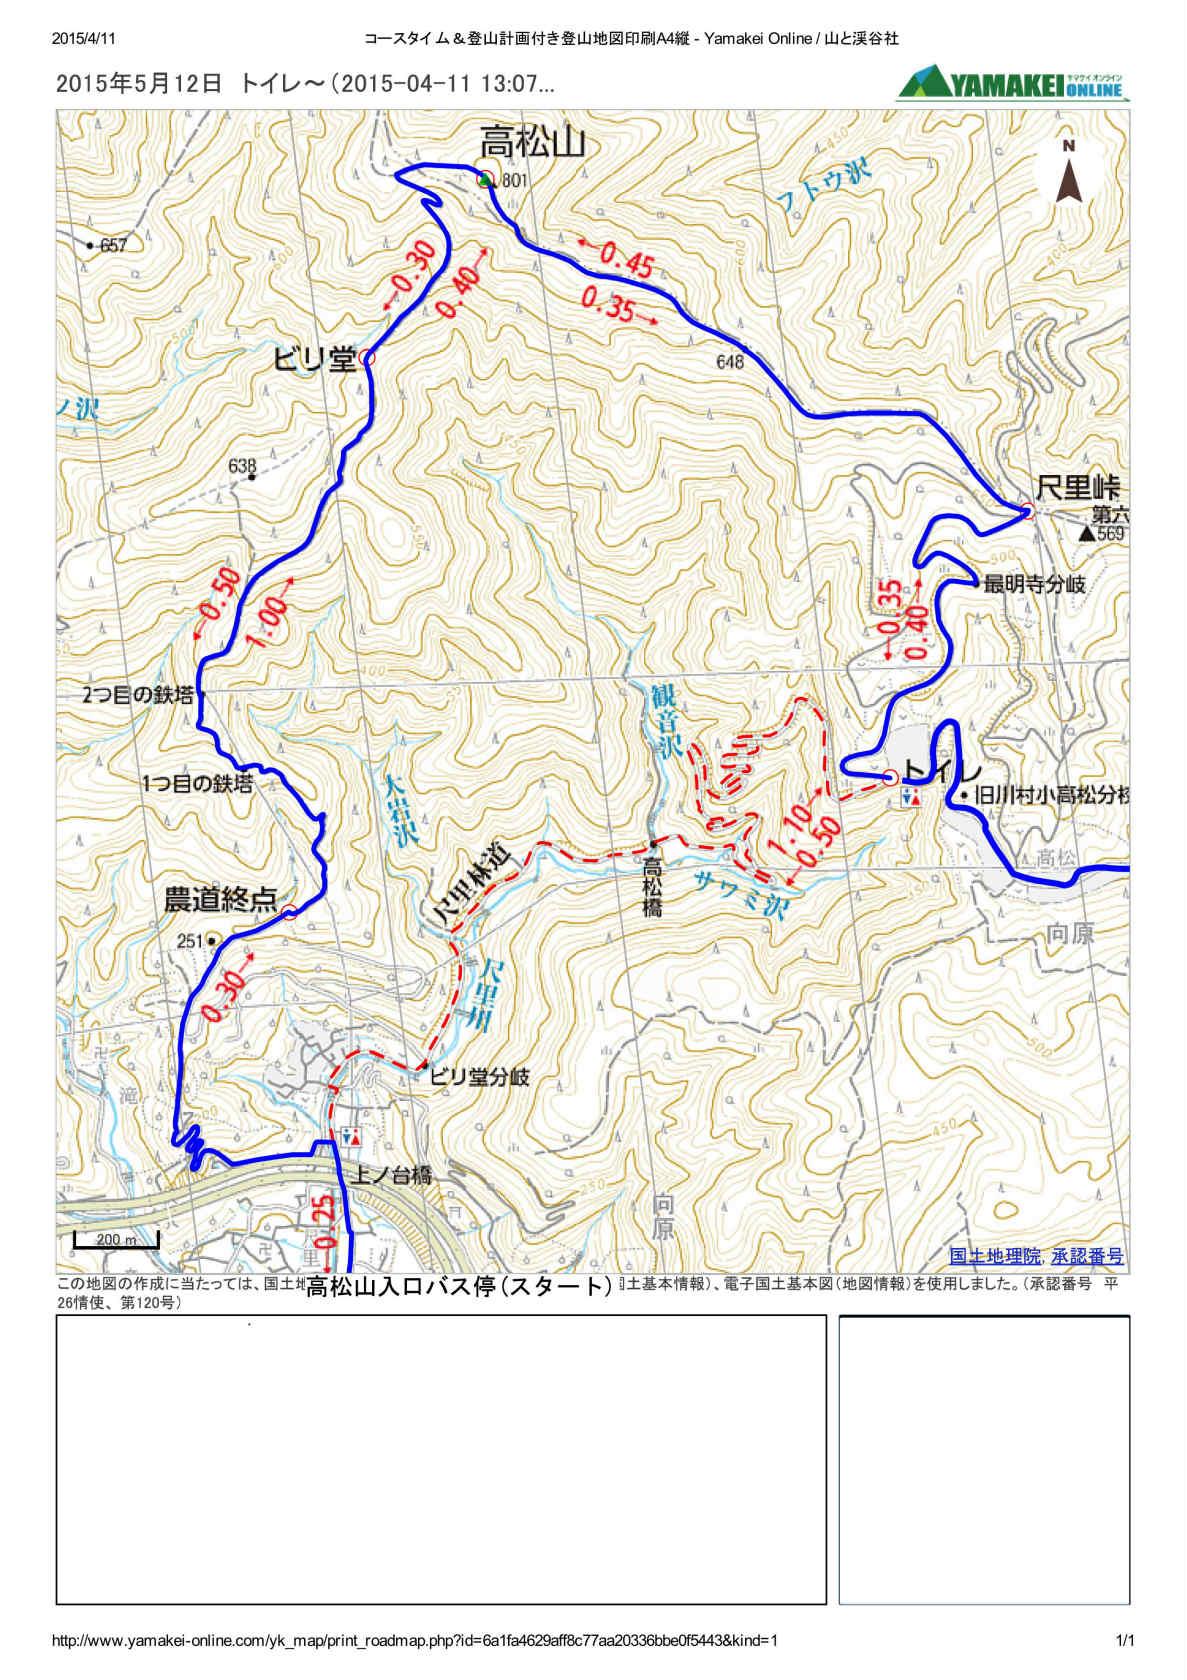 s高松山・松田山 コースタイム 登山地図(1)- Yamakei Online